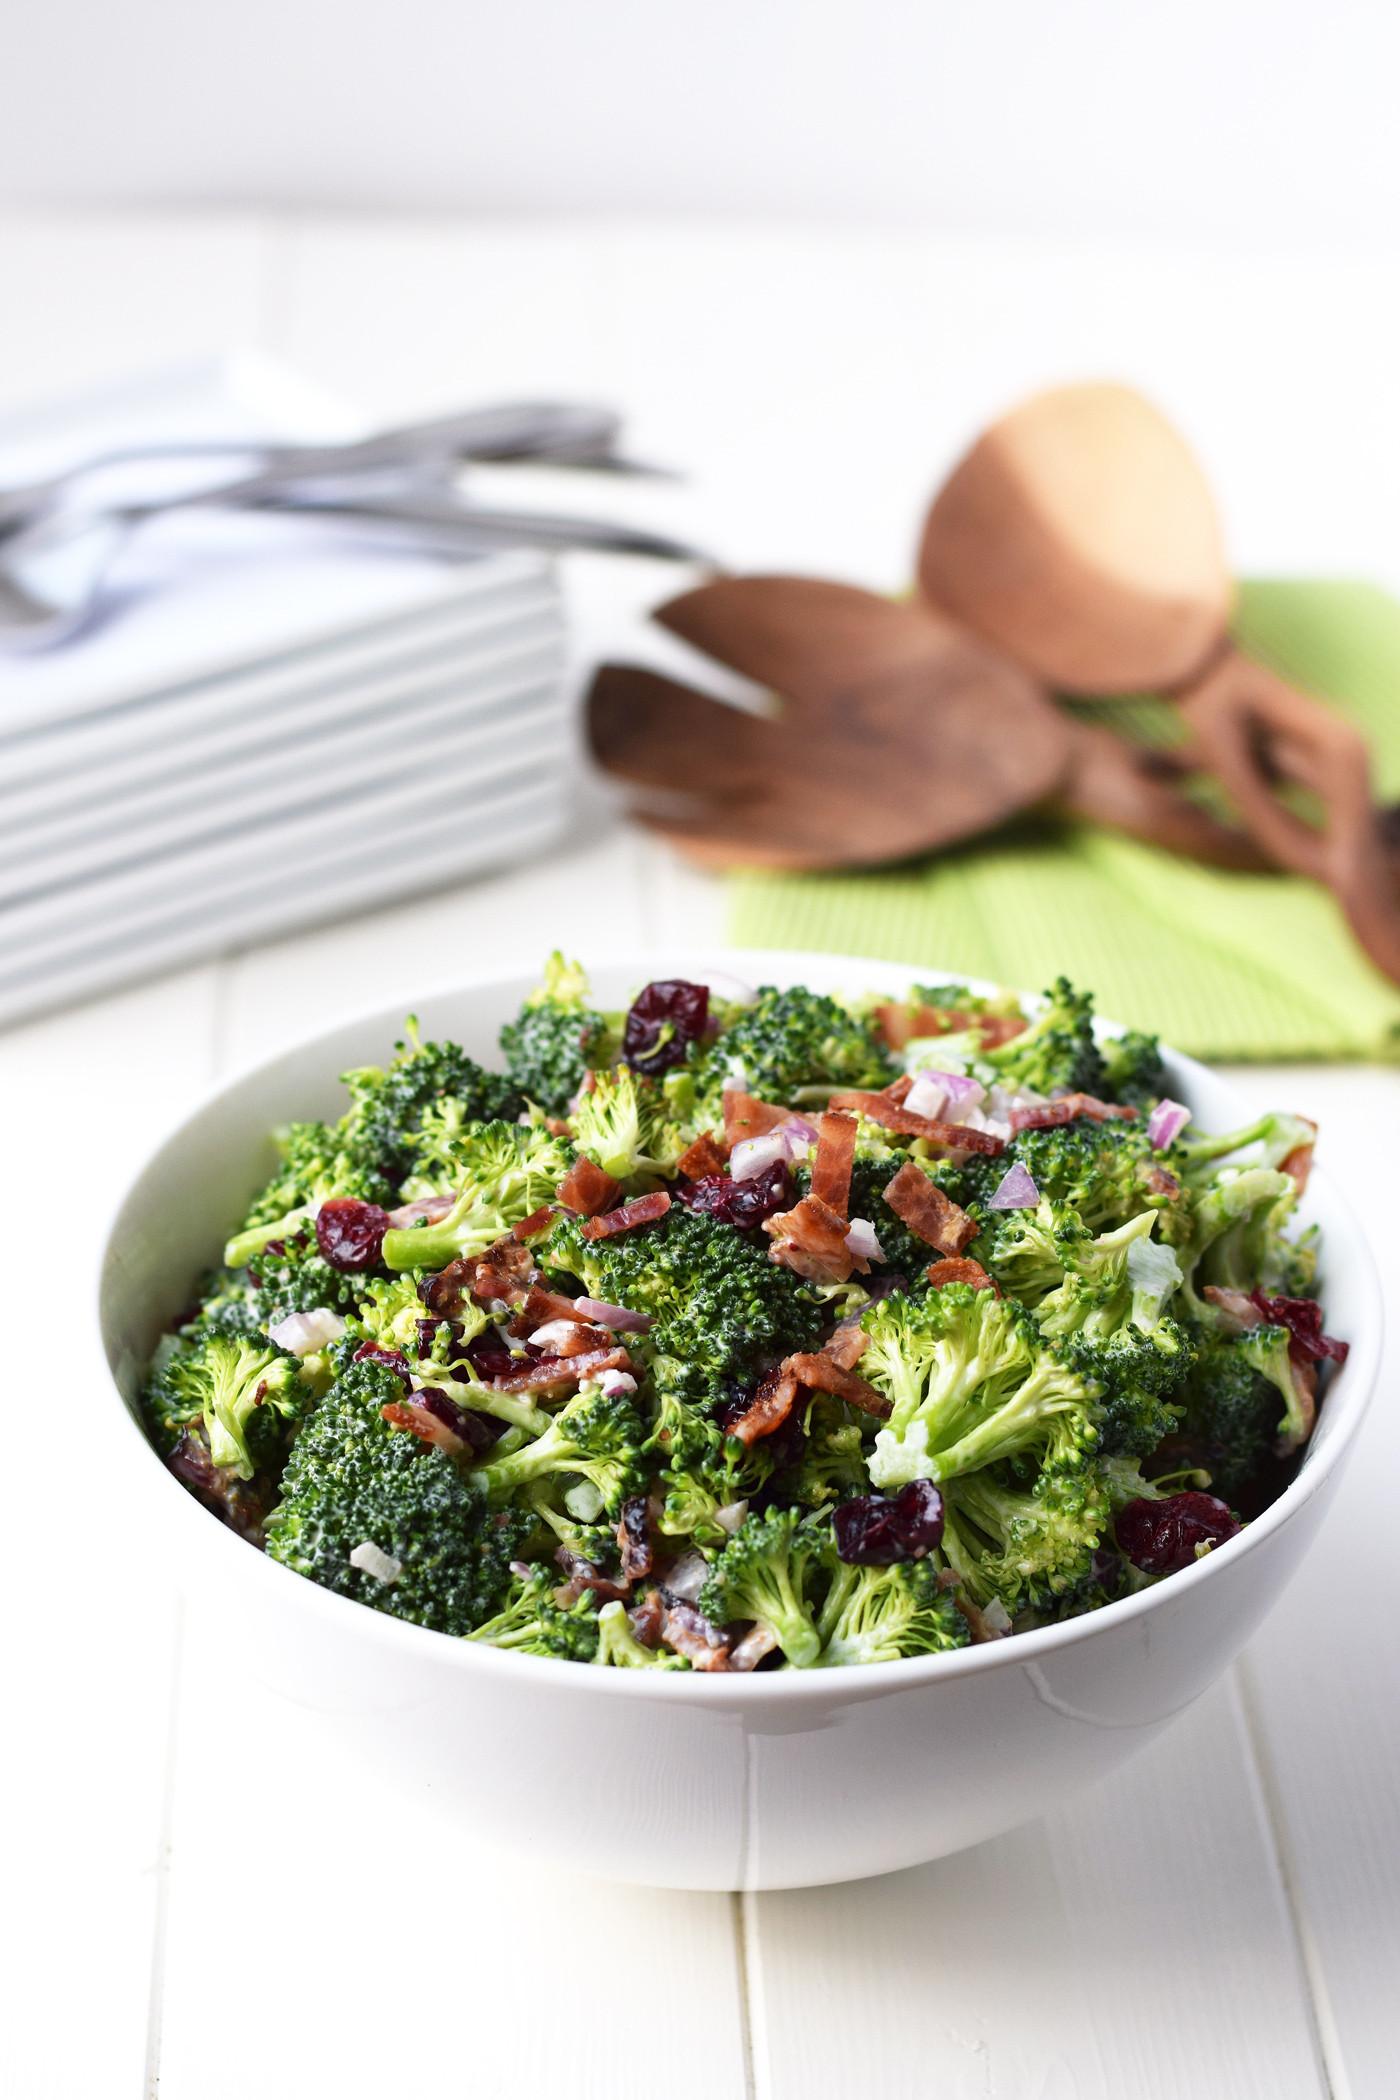 Healthy Broccoli Salad Recipe  healthy broccoli salad recipe with greek yogurt